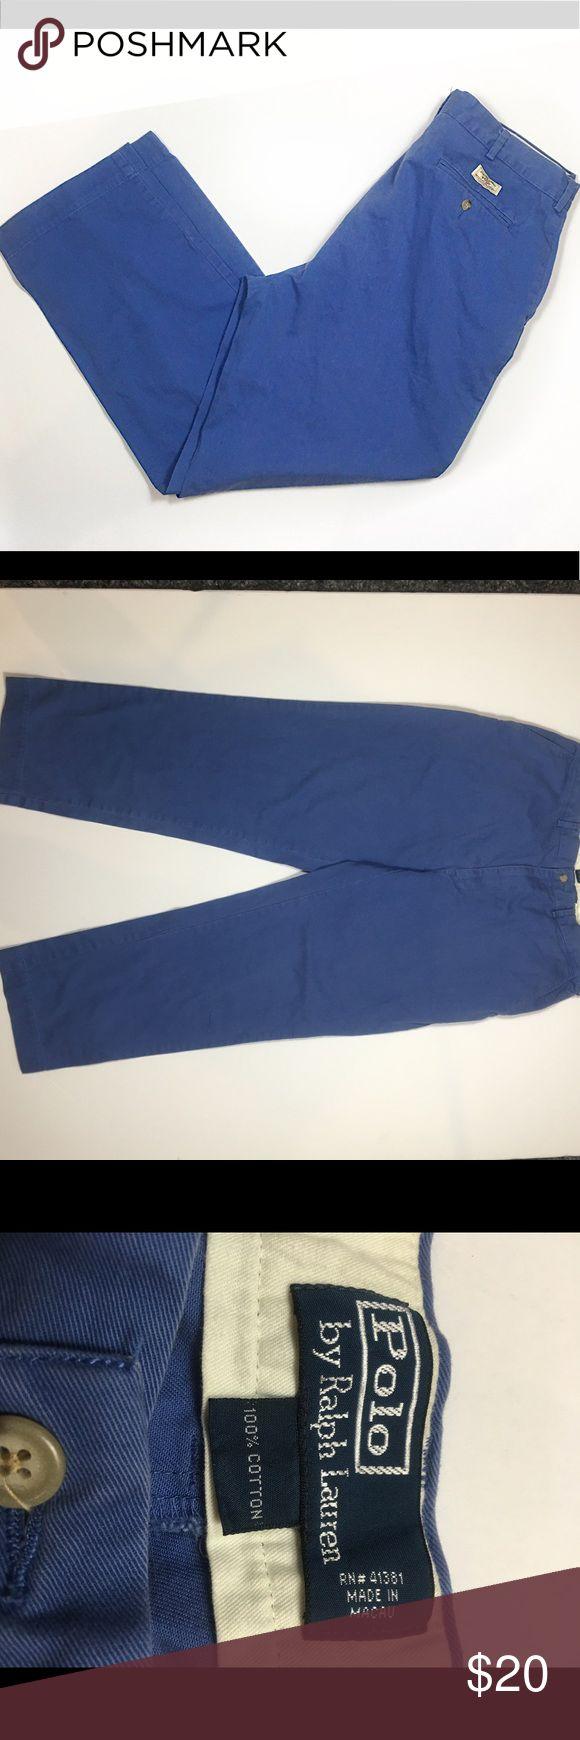 Polo Ralph Lauren men's pants size 36x30 36x30 Polo by Ralph Lauren Pants